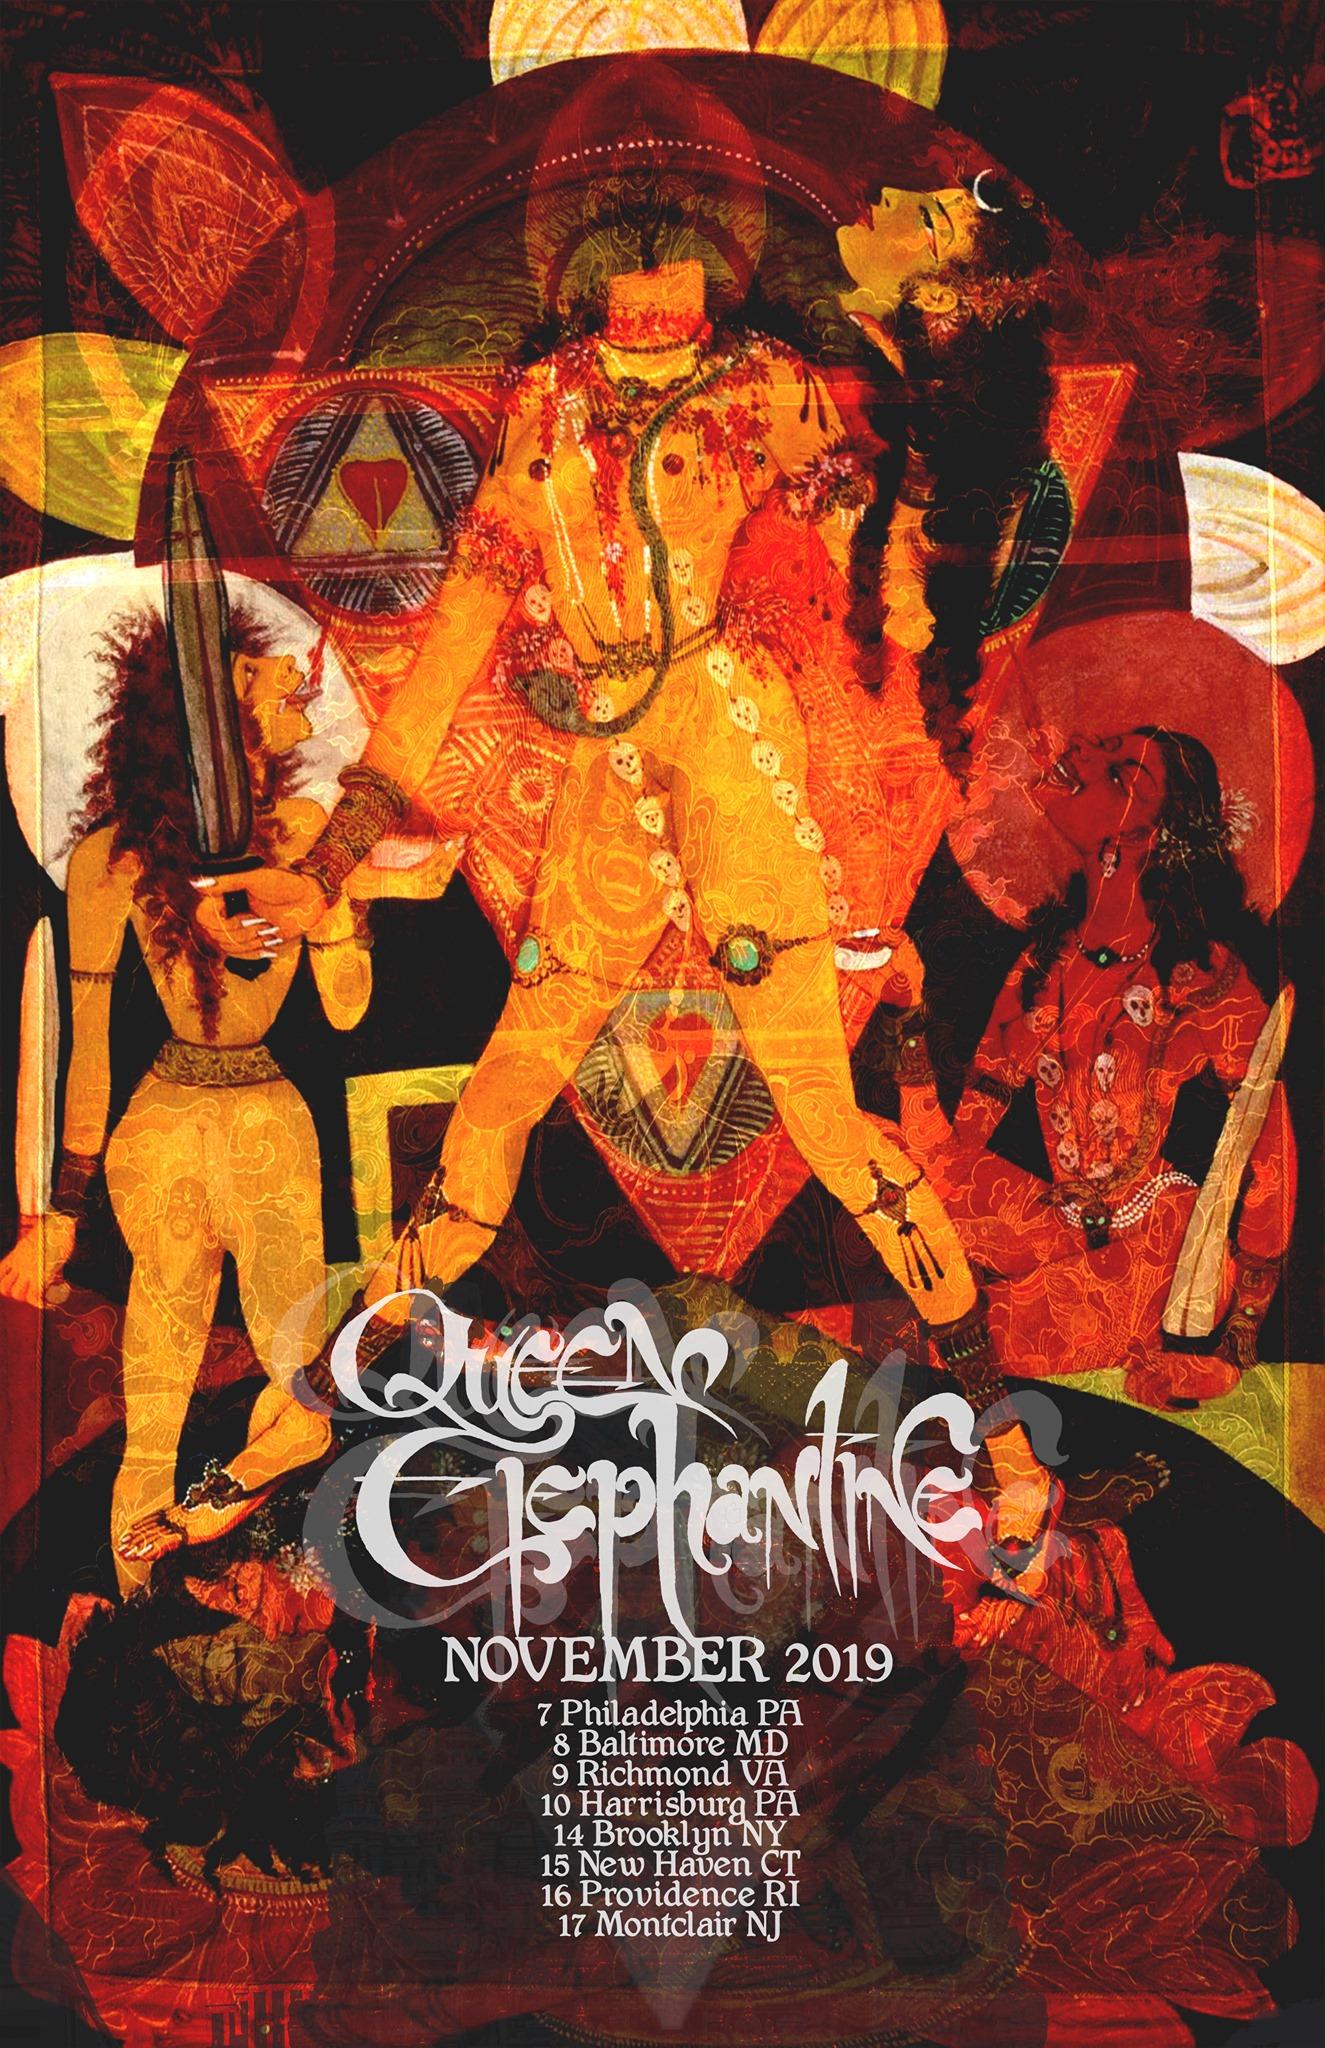 queen elephentine november tour